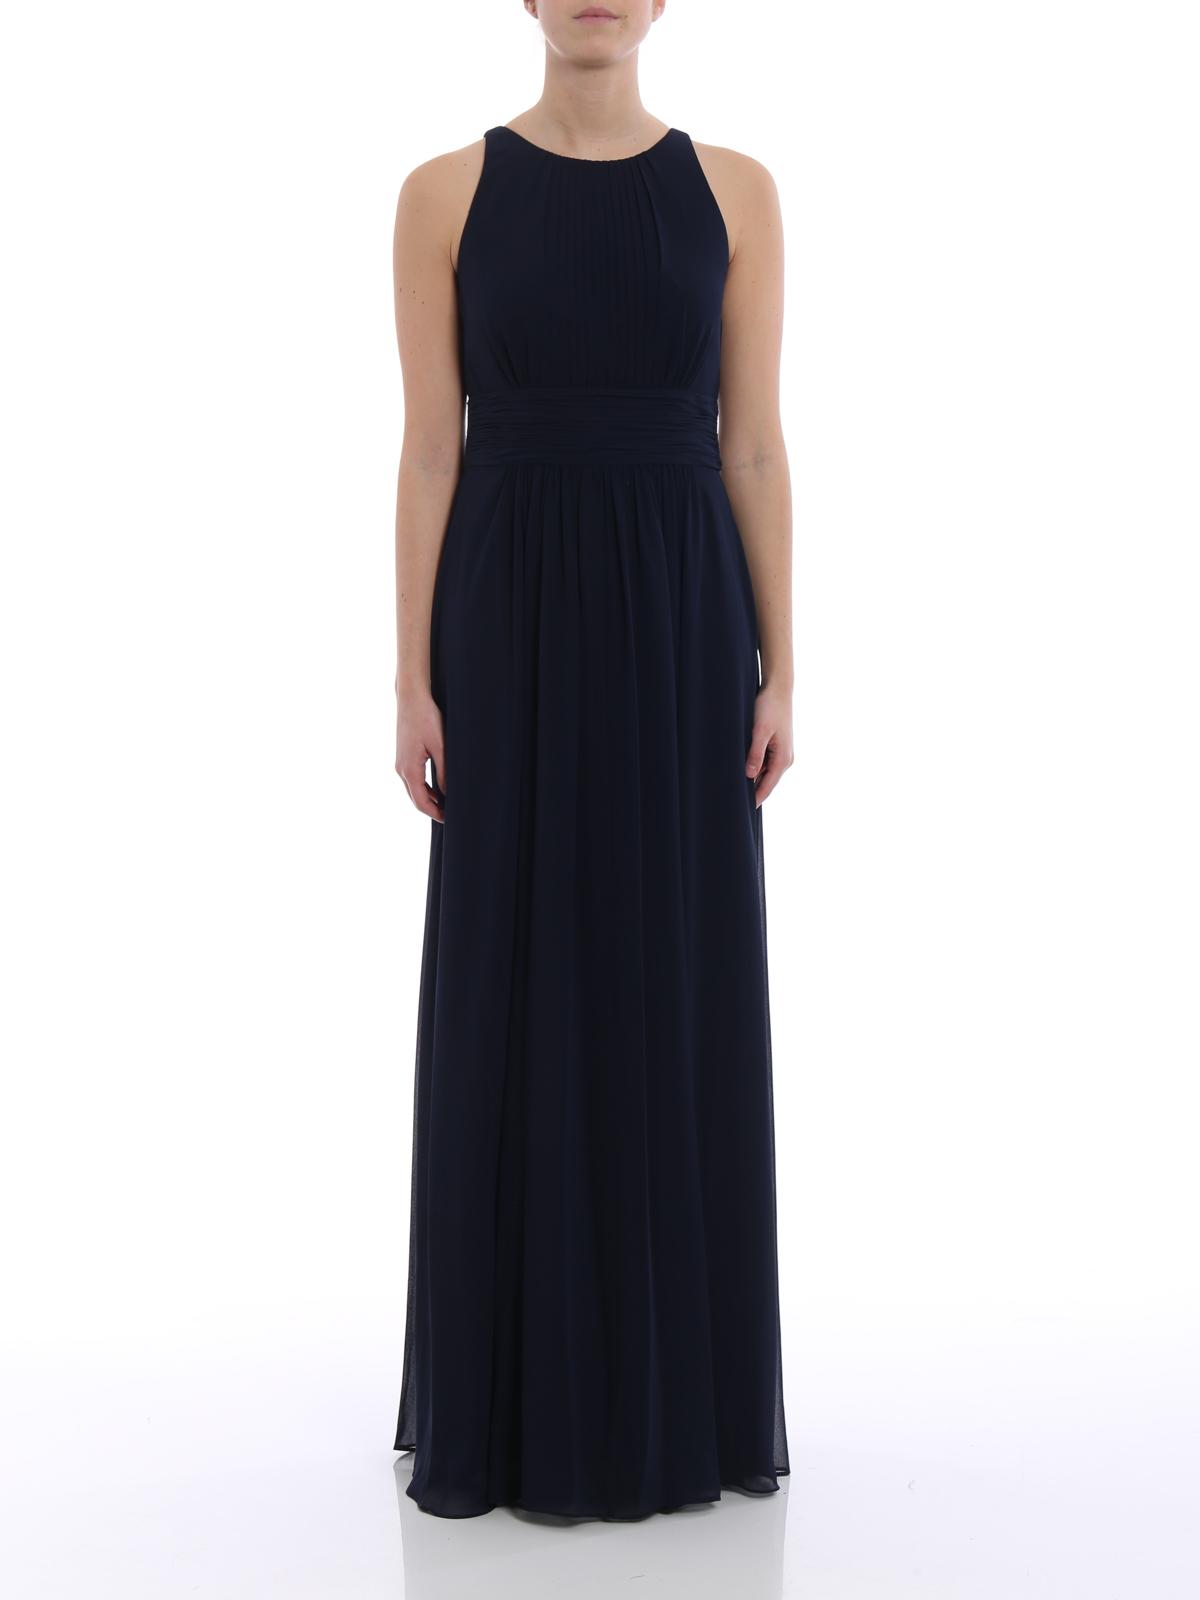 Ikrix Lauren Ralph Evening Dresses Niketta Georgette Long Gown